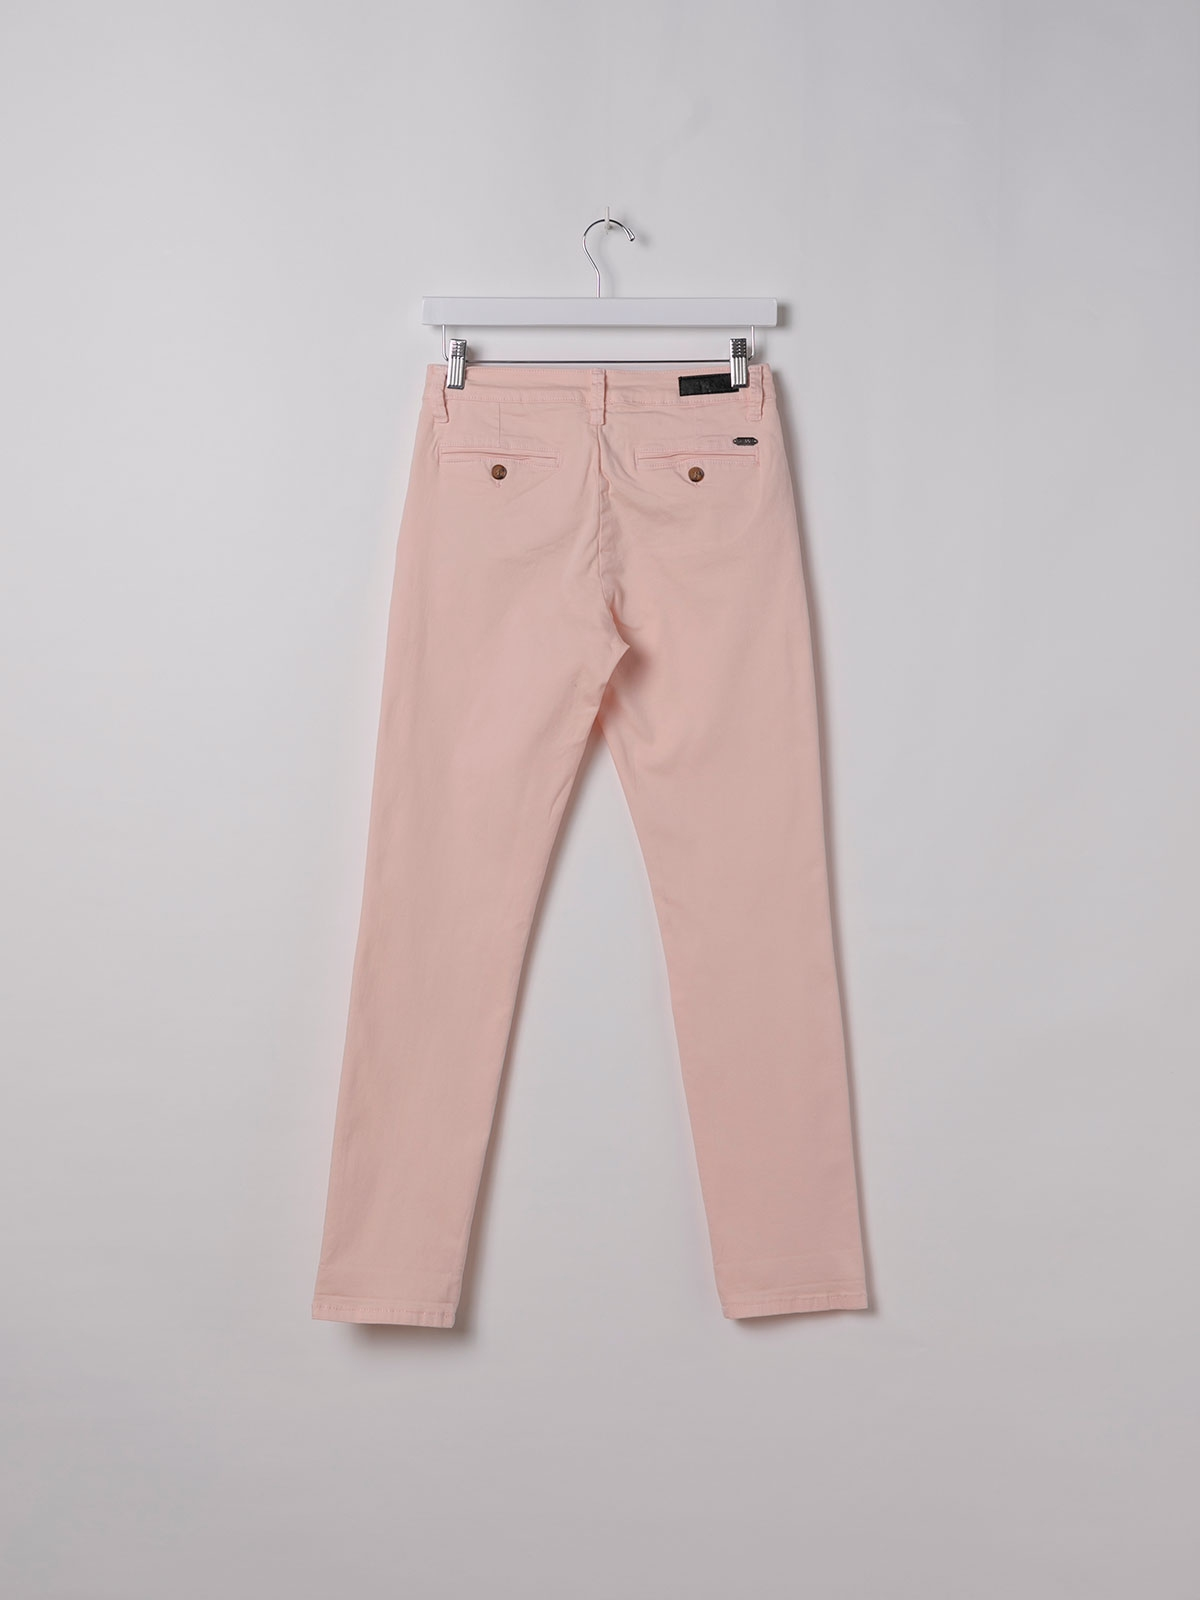 Pantalón chino mujer algodón elastico Rosa